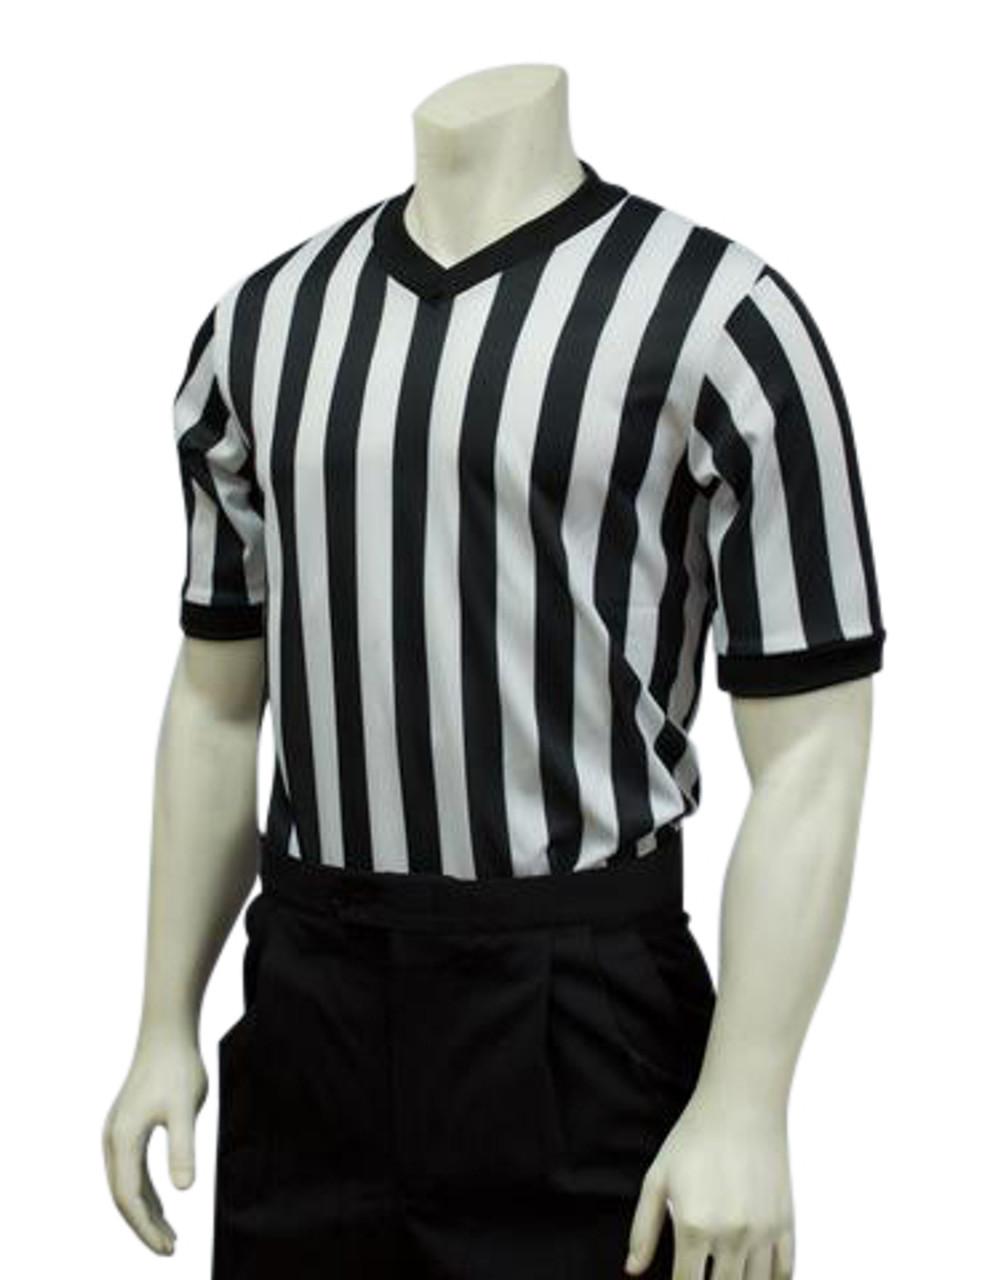 Smitty Elite Basketball Referee Shirt